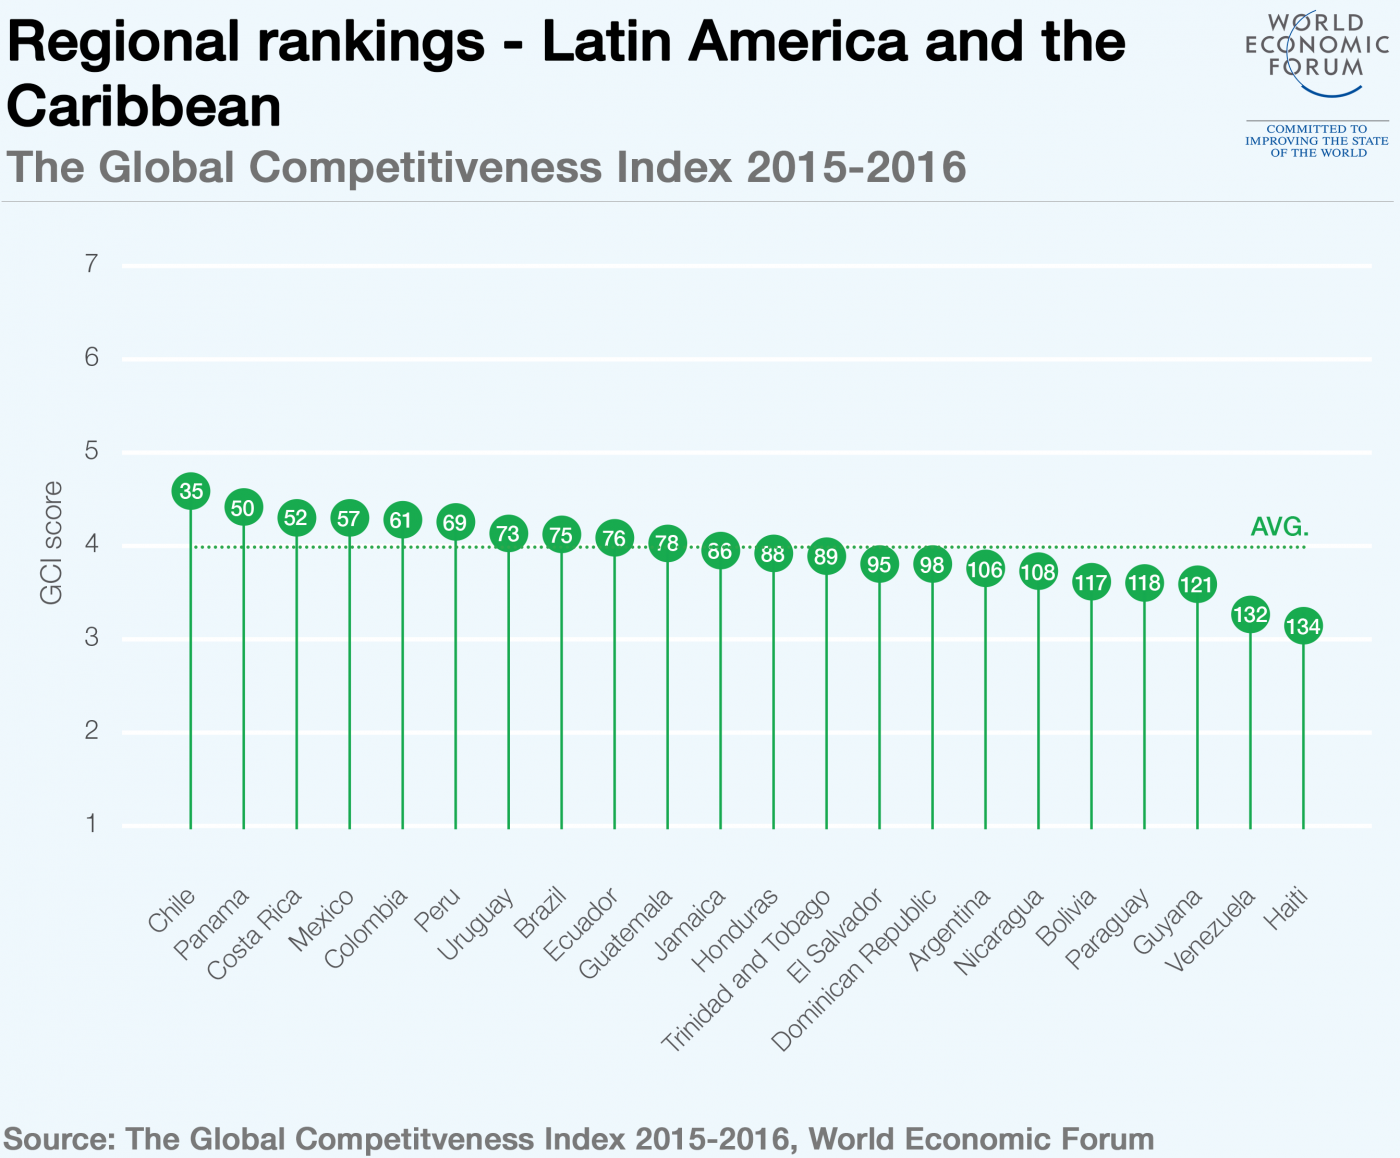 Global competitiveness in Latin America